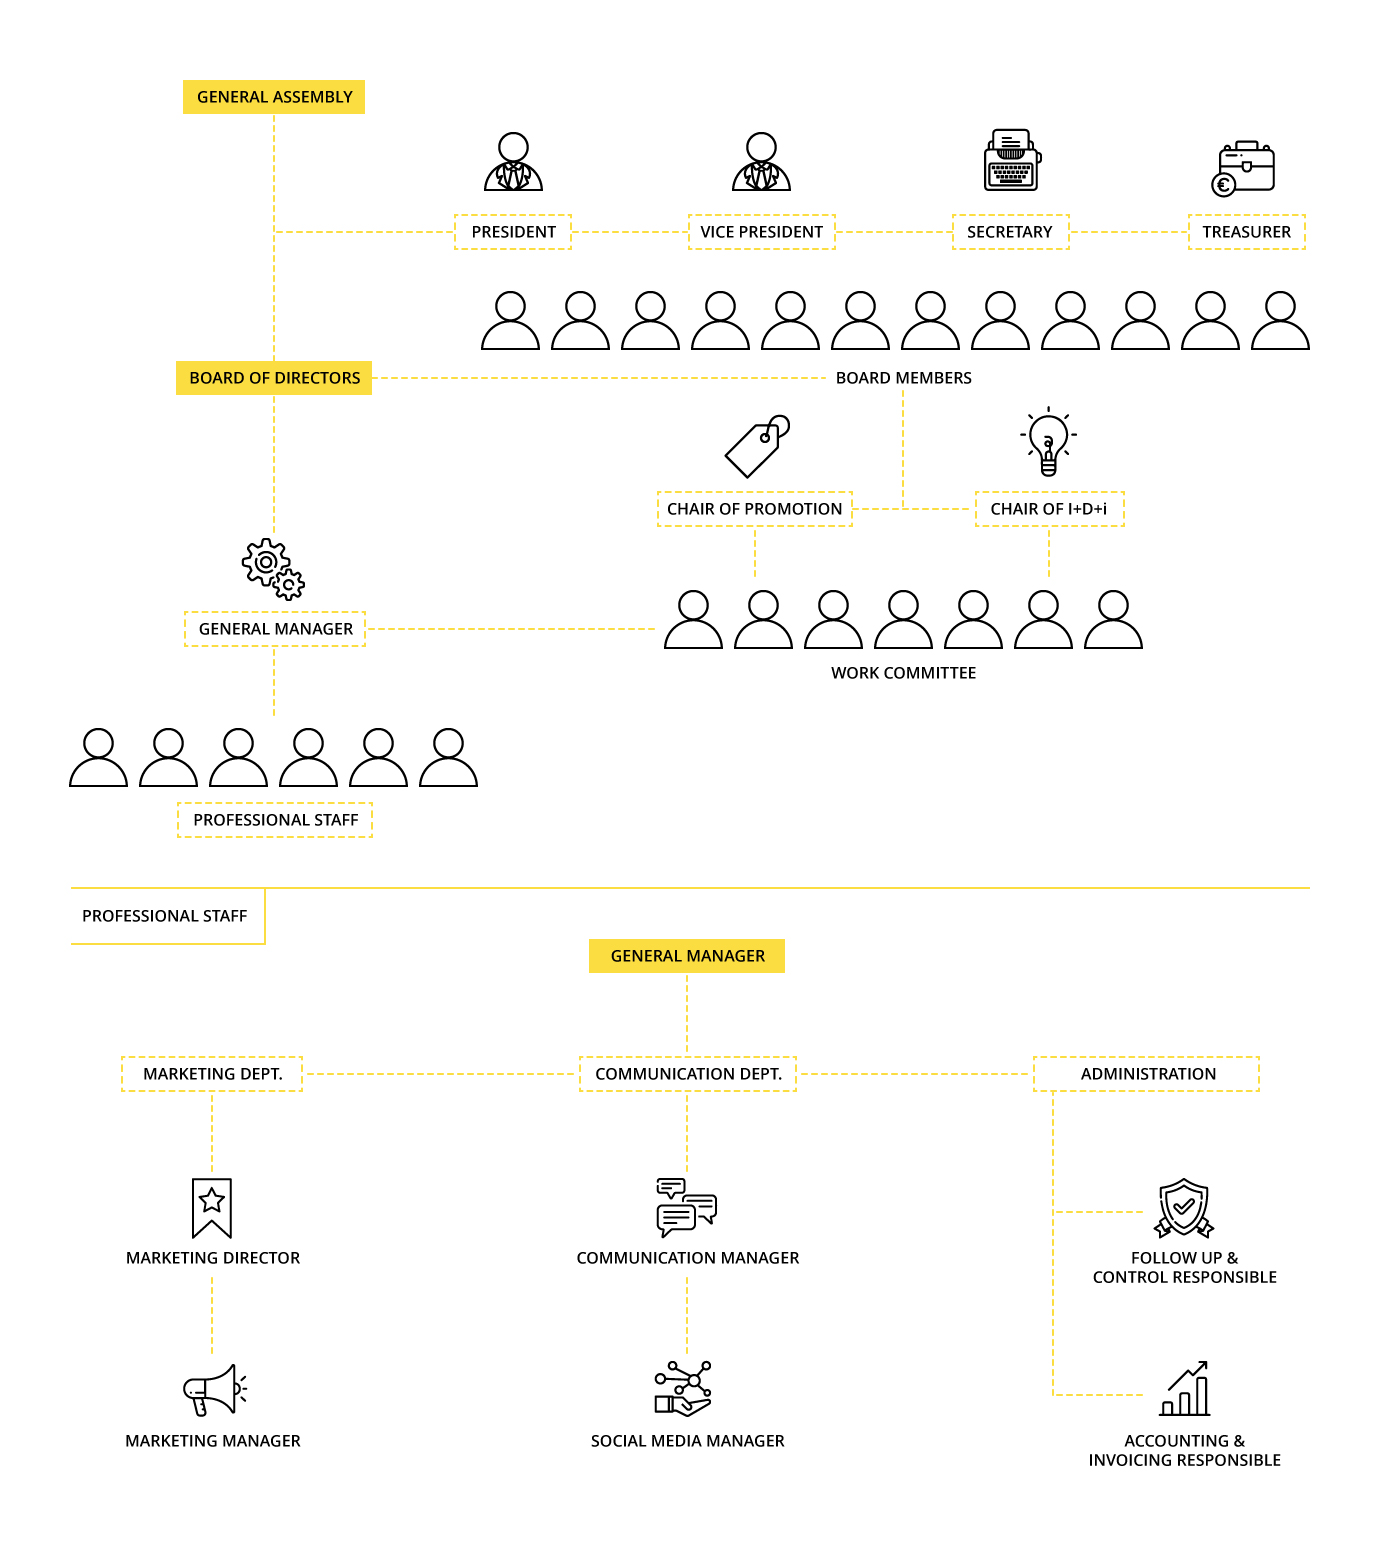 Organization chart of the Spanish Olive Oil Interprofessional